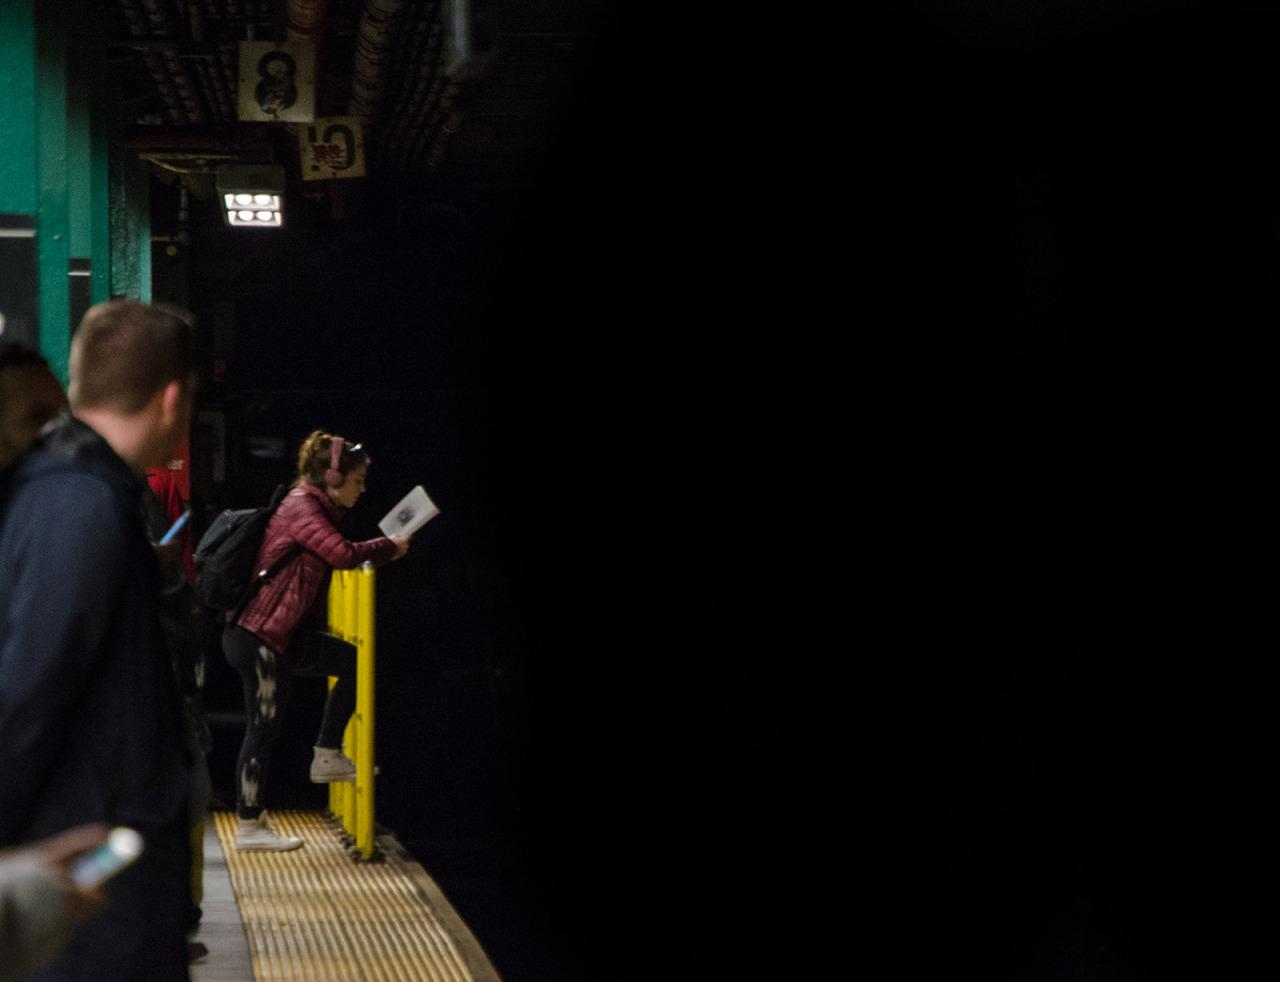 Reading on the platform. Metropolitan Avenue G Train stop. Williamsburg, Brooklyn, NYC.